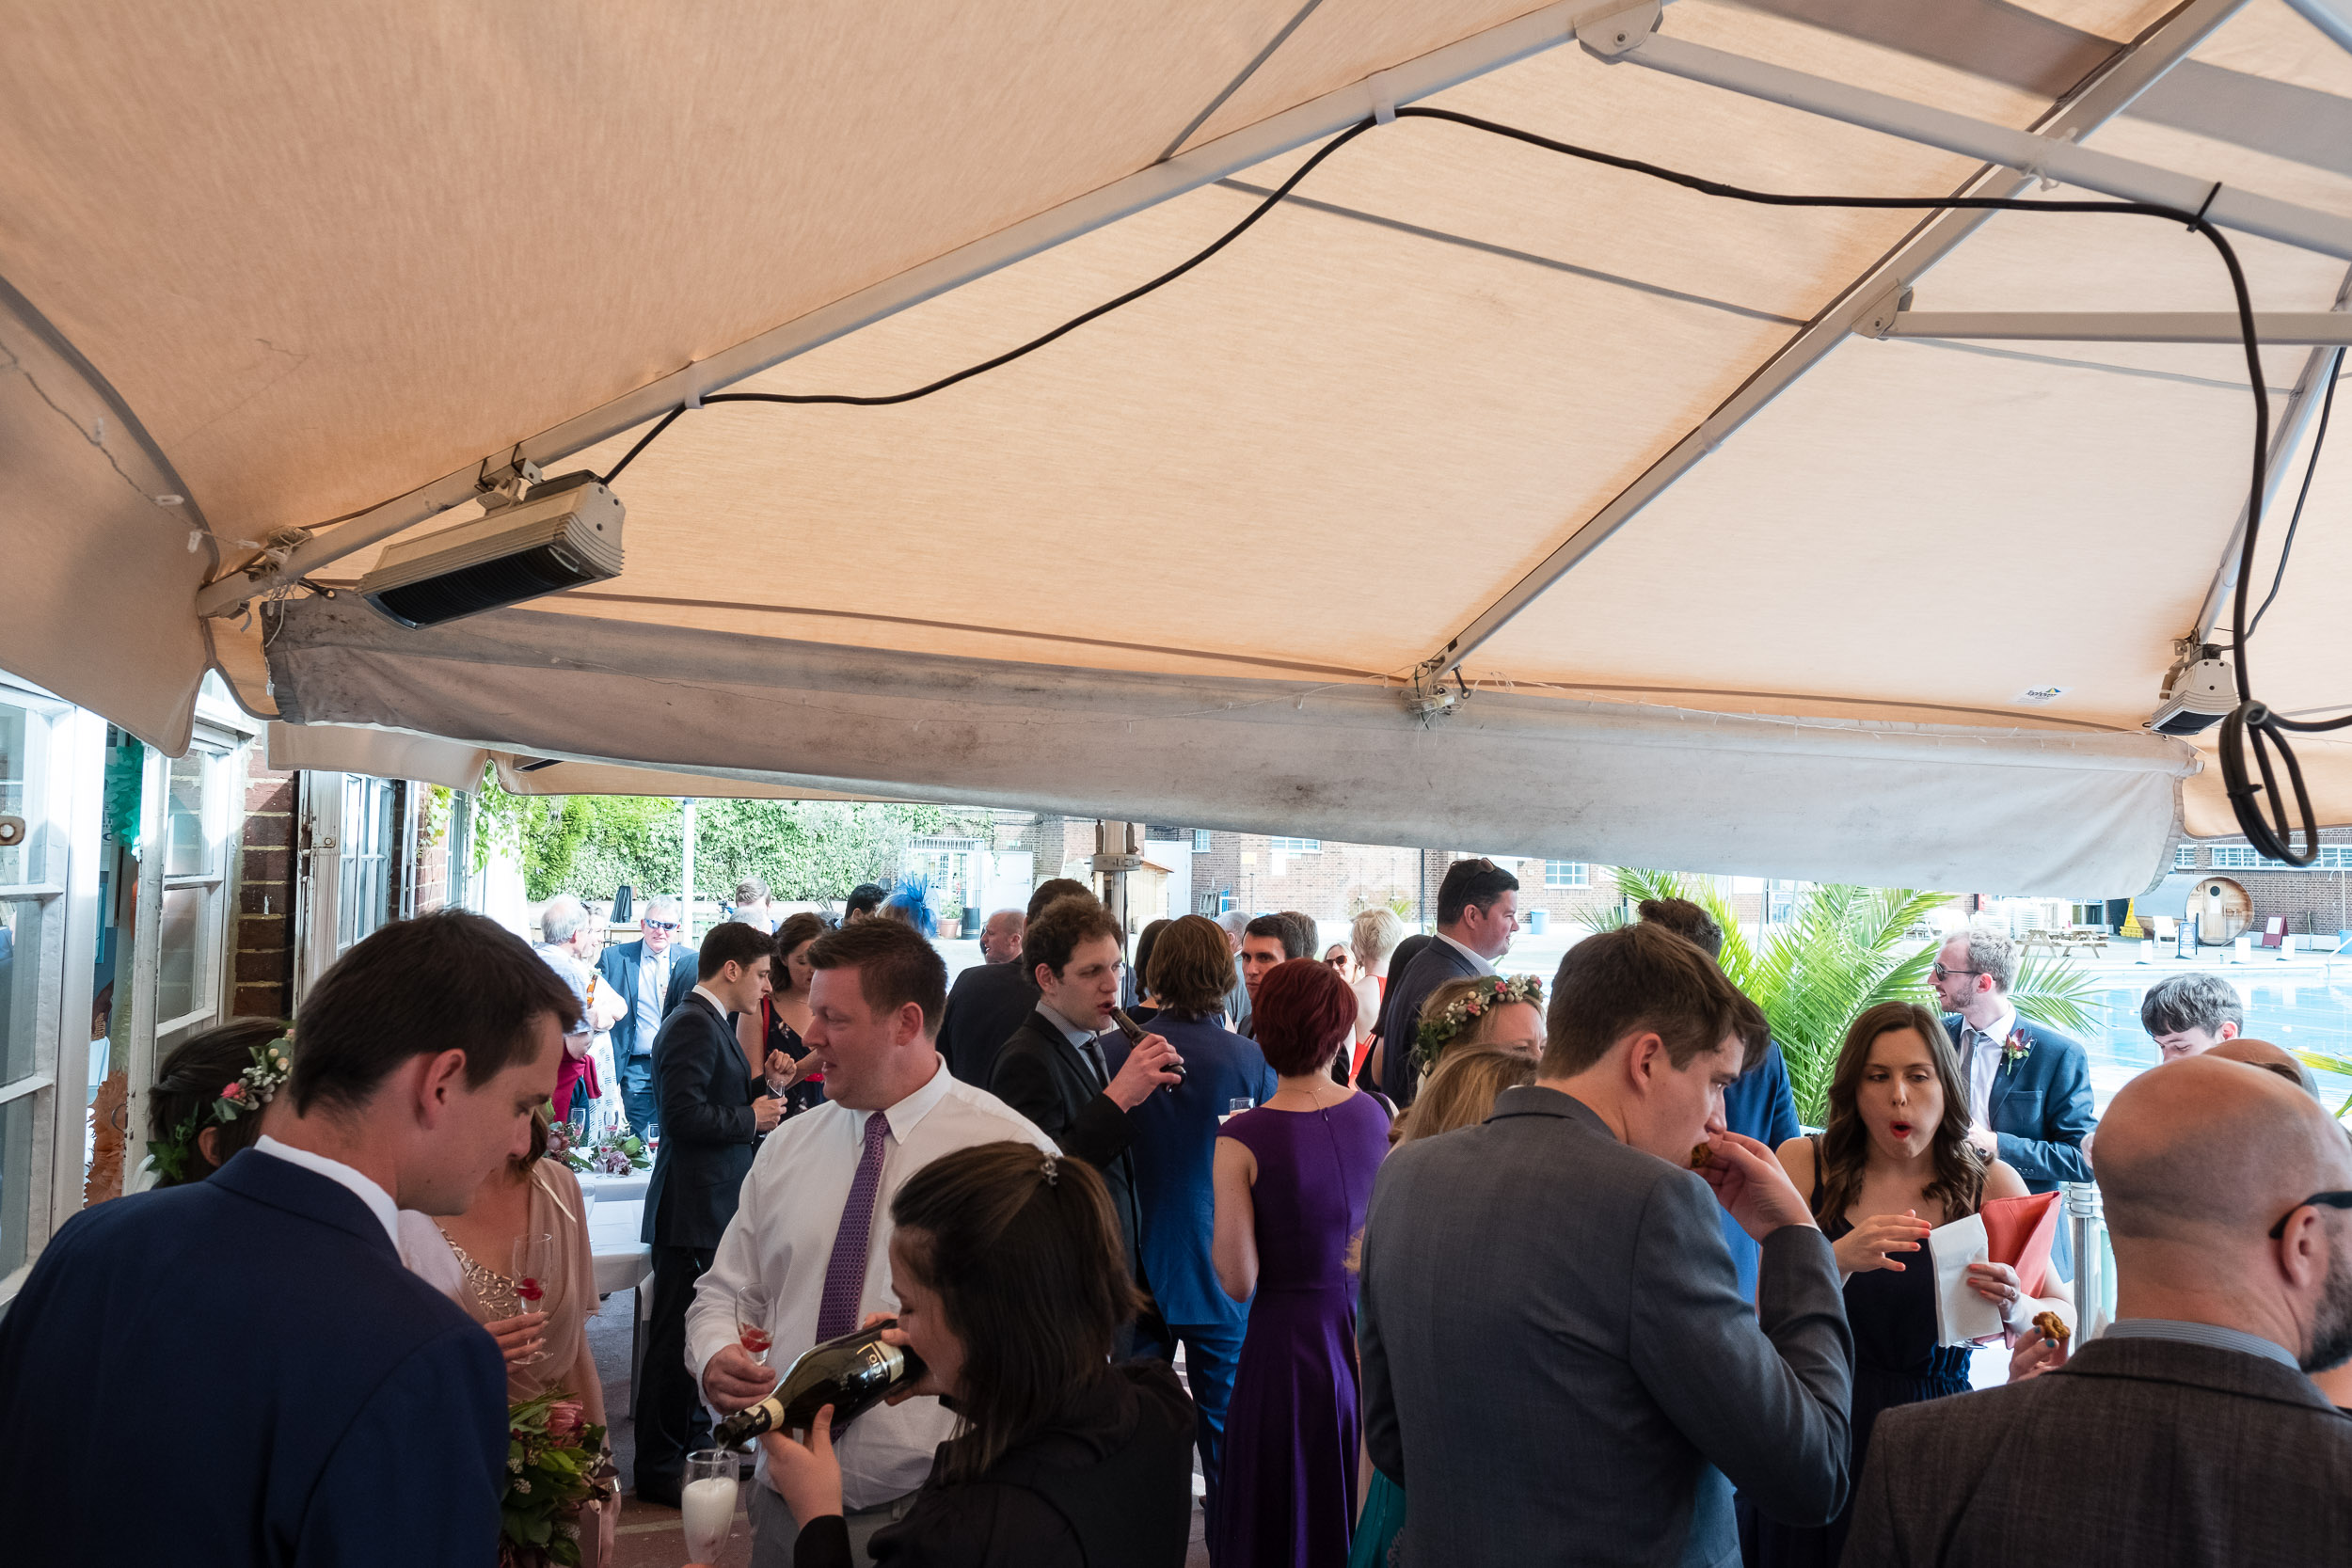 brockwell-lido-brixton-herne-hill-wedding-241.jpg